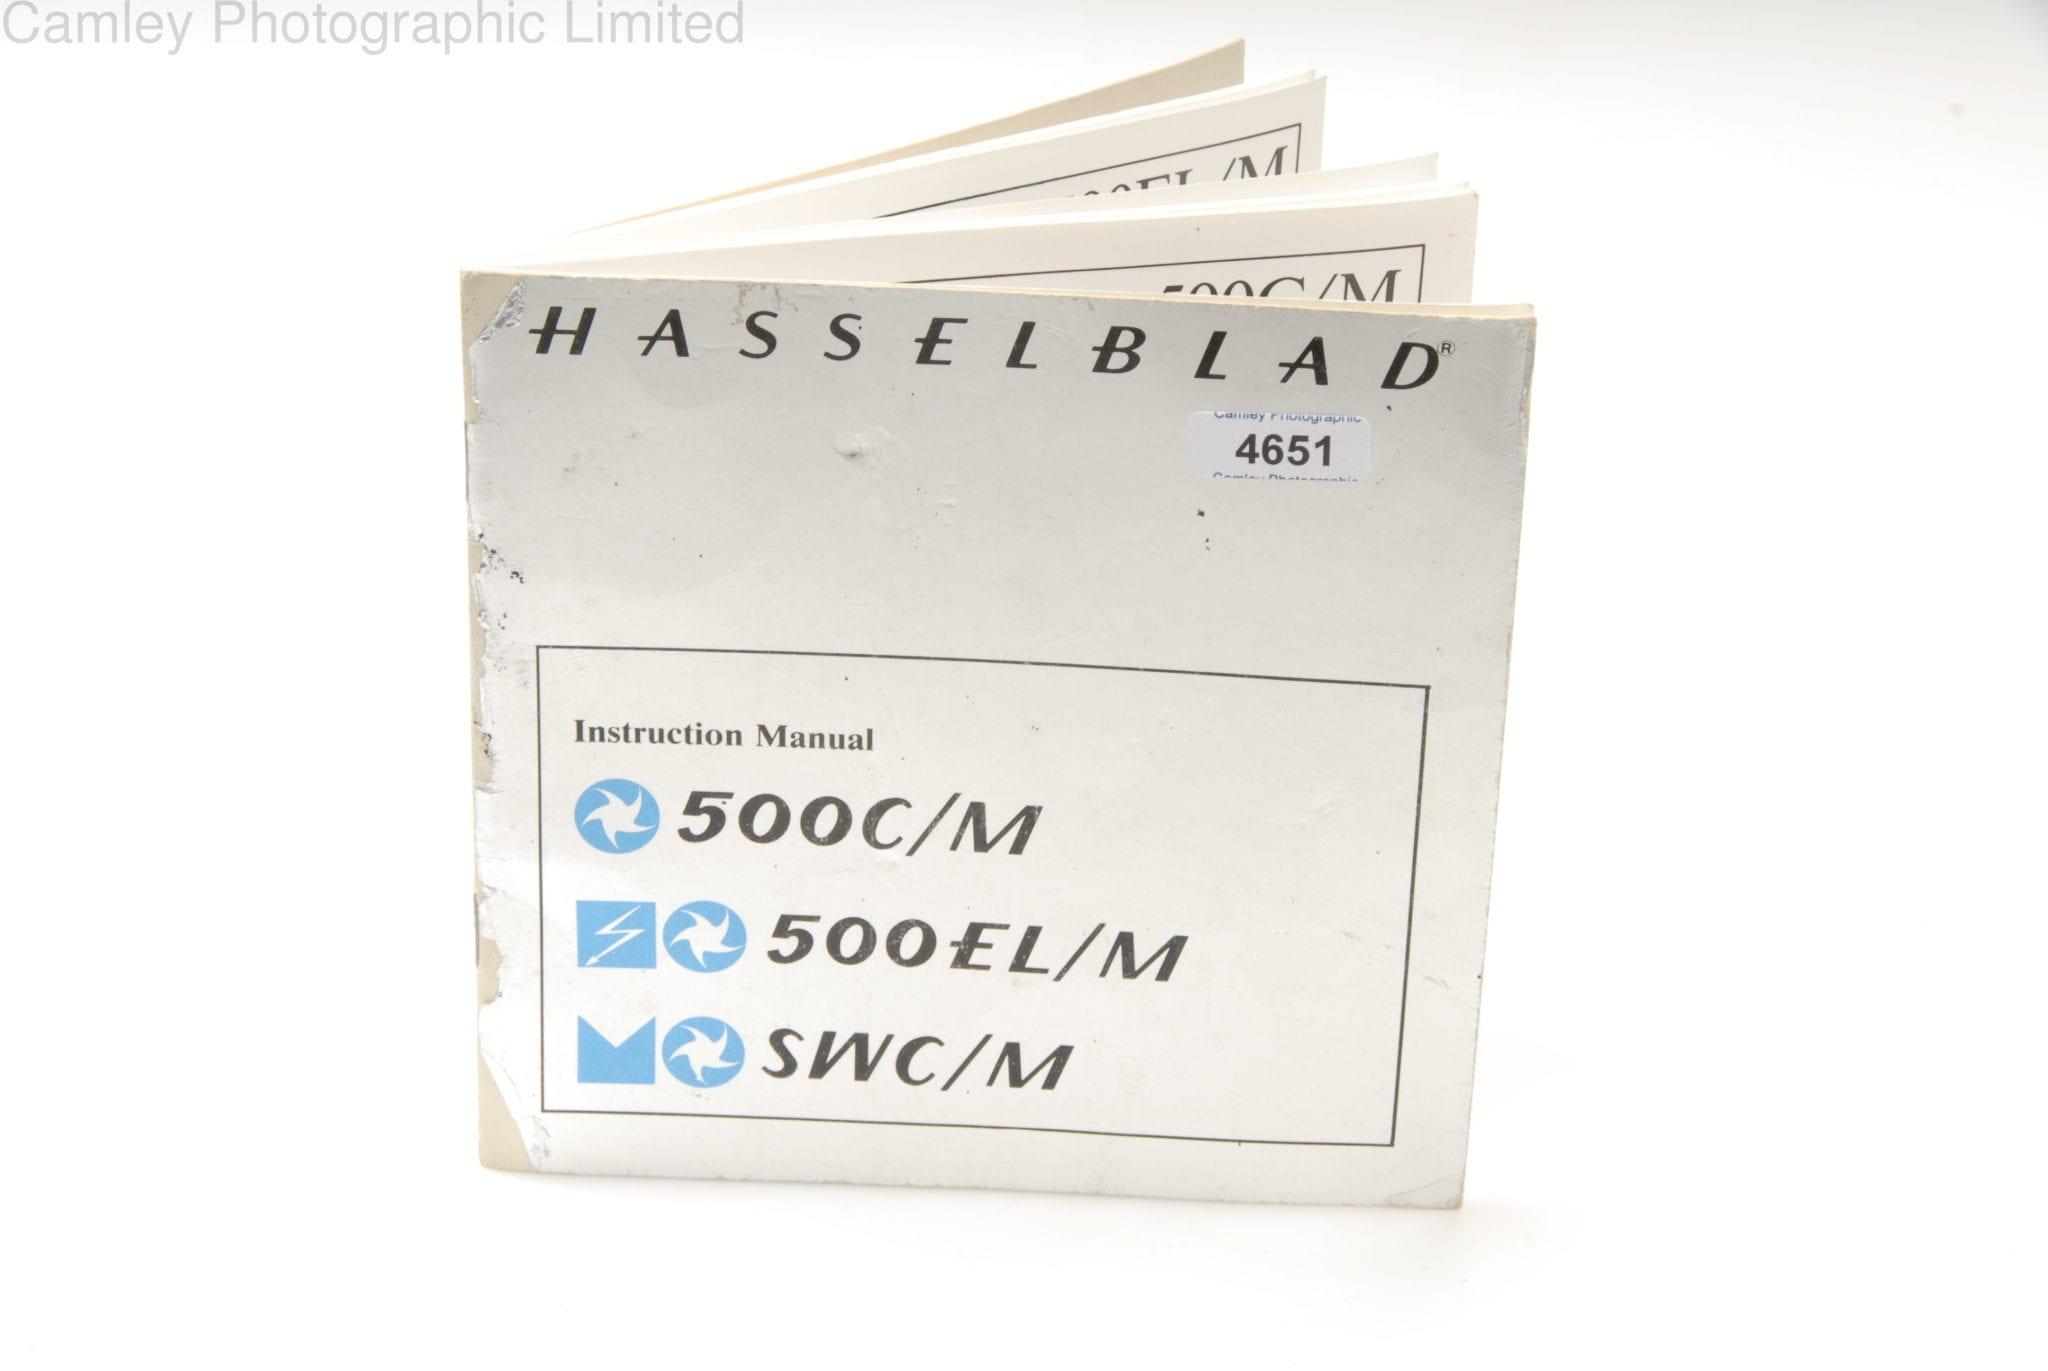 Hasselblad 500c repair manual